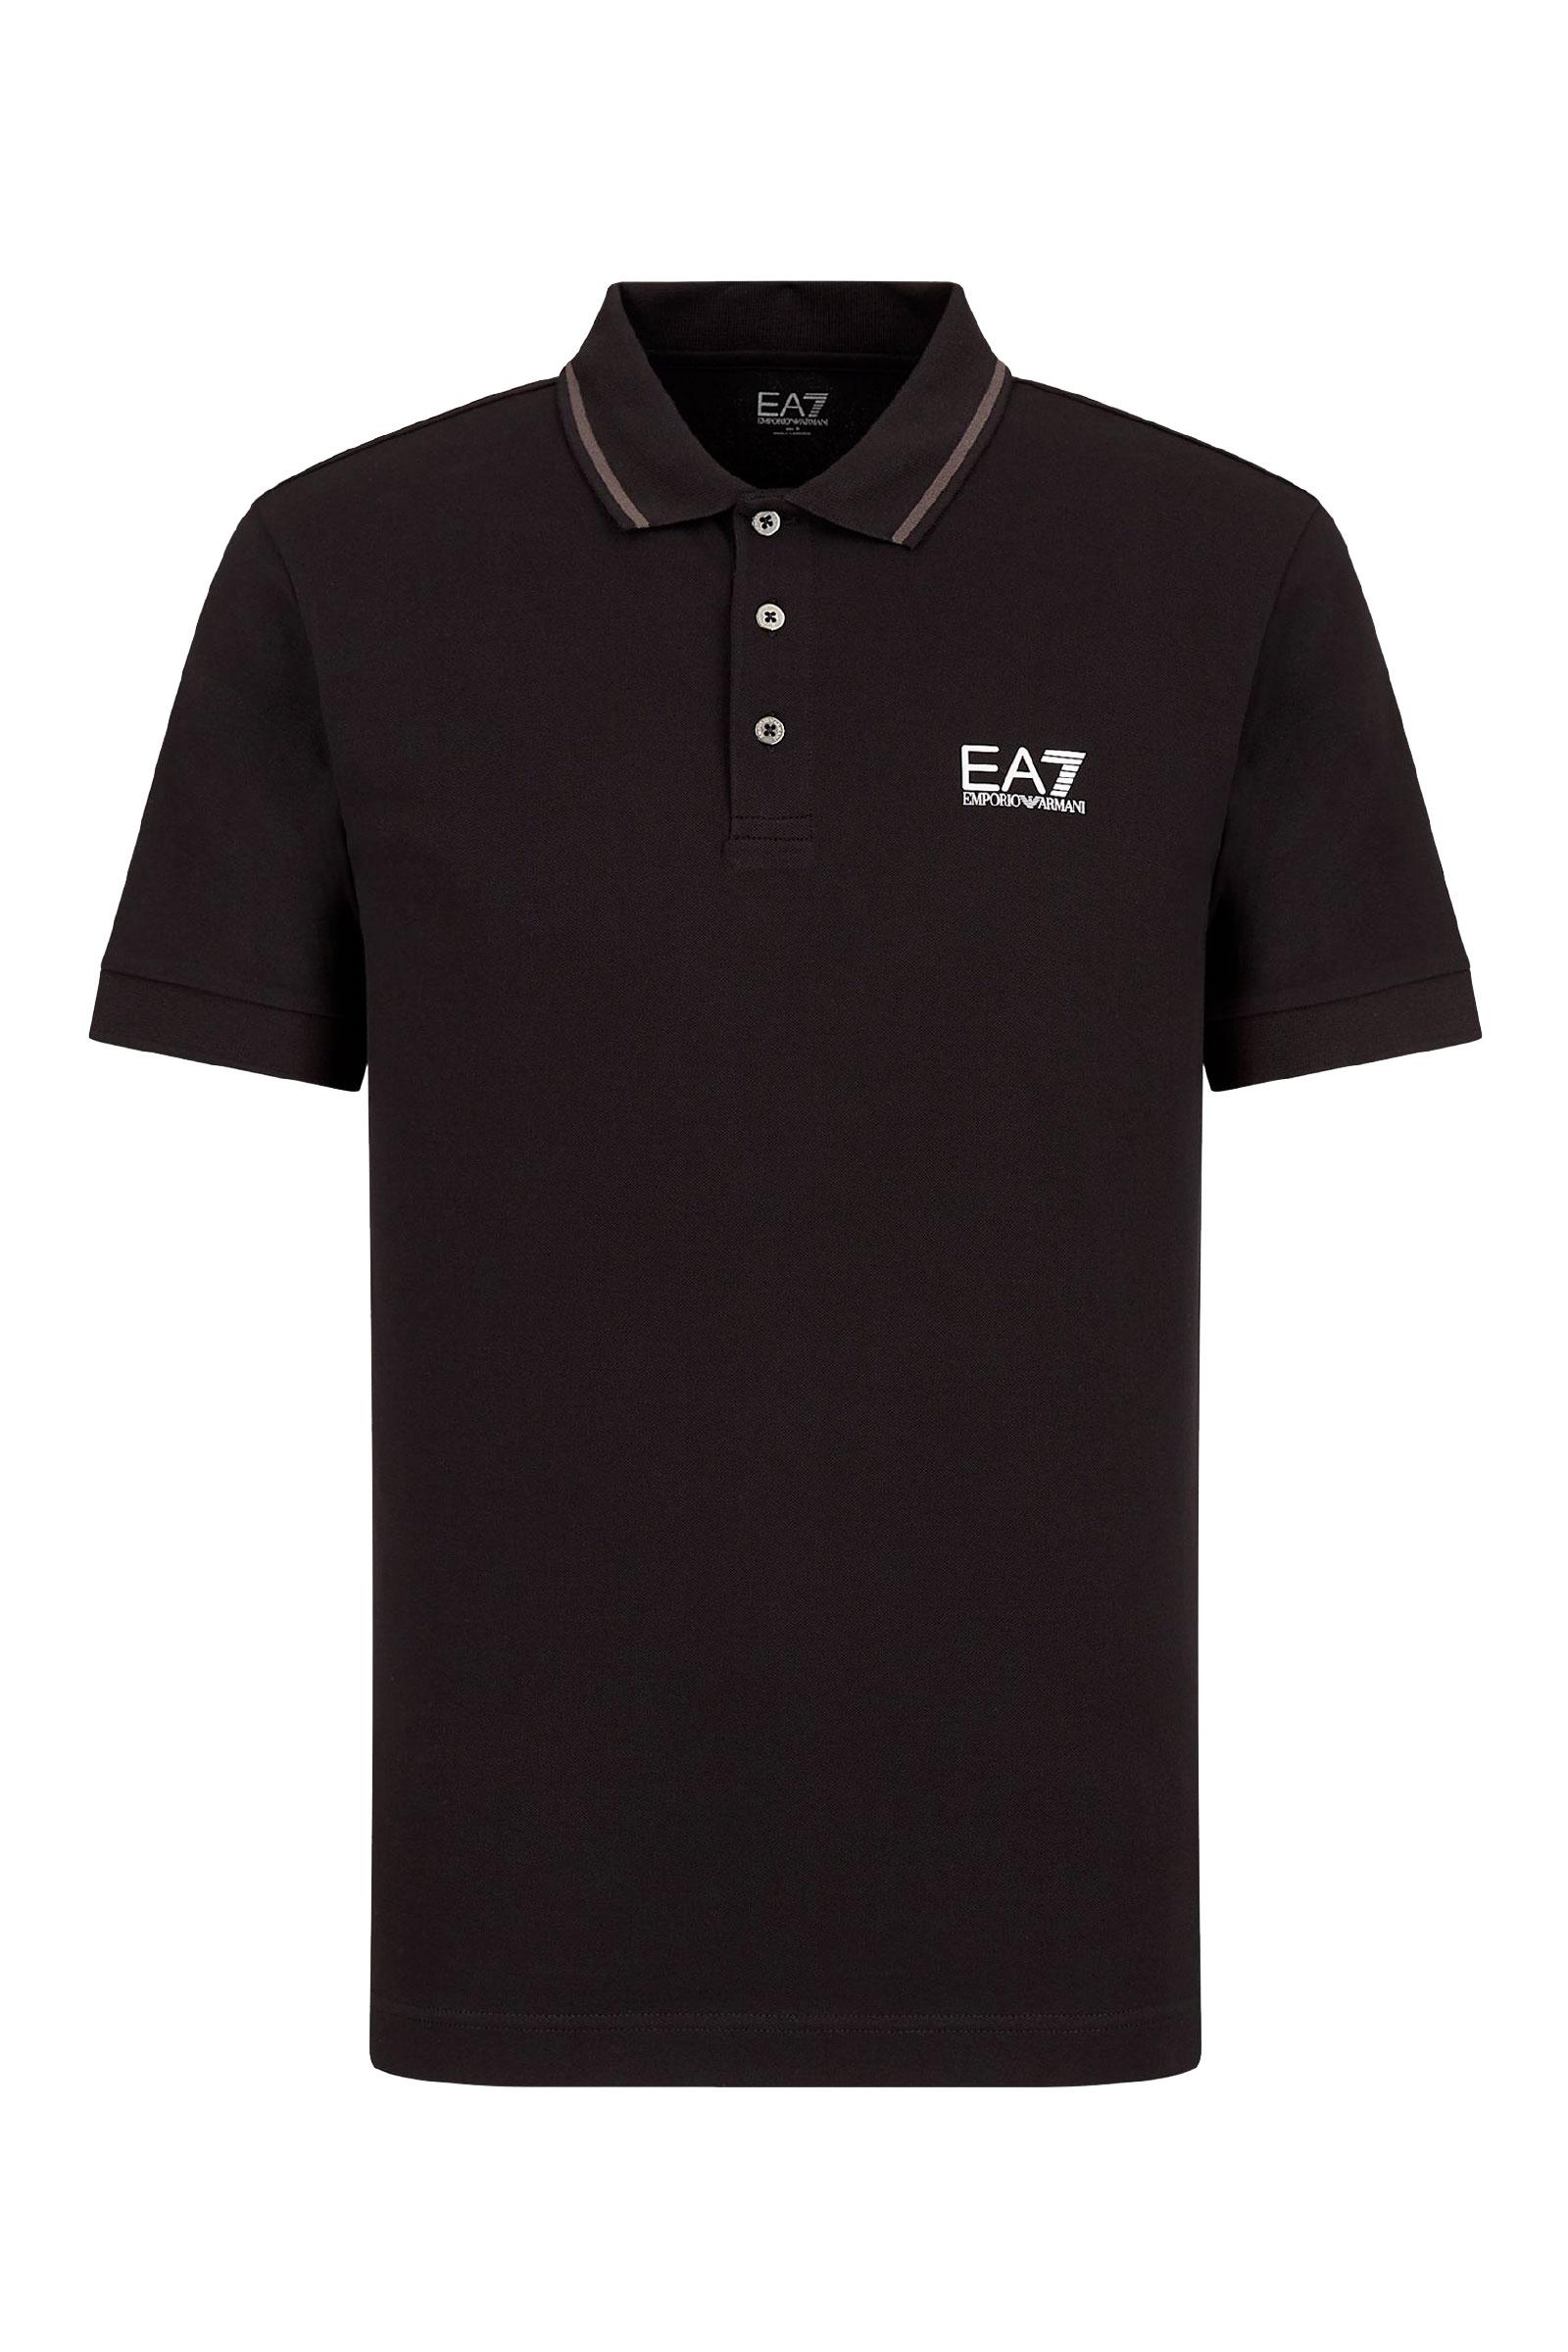 ARMANI EA7 Men's Polo Shirt ARMANI EA7 |  | 8NPF06 PJ04Z1200